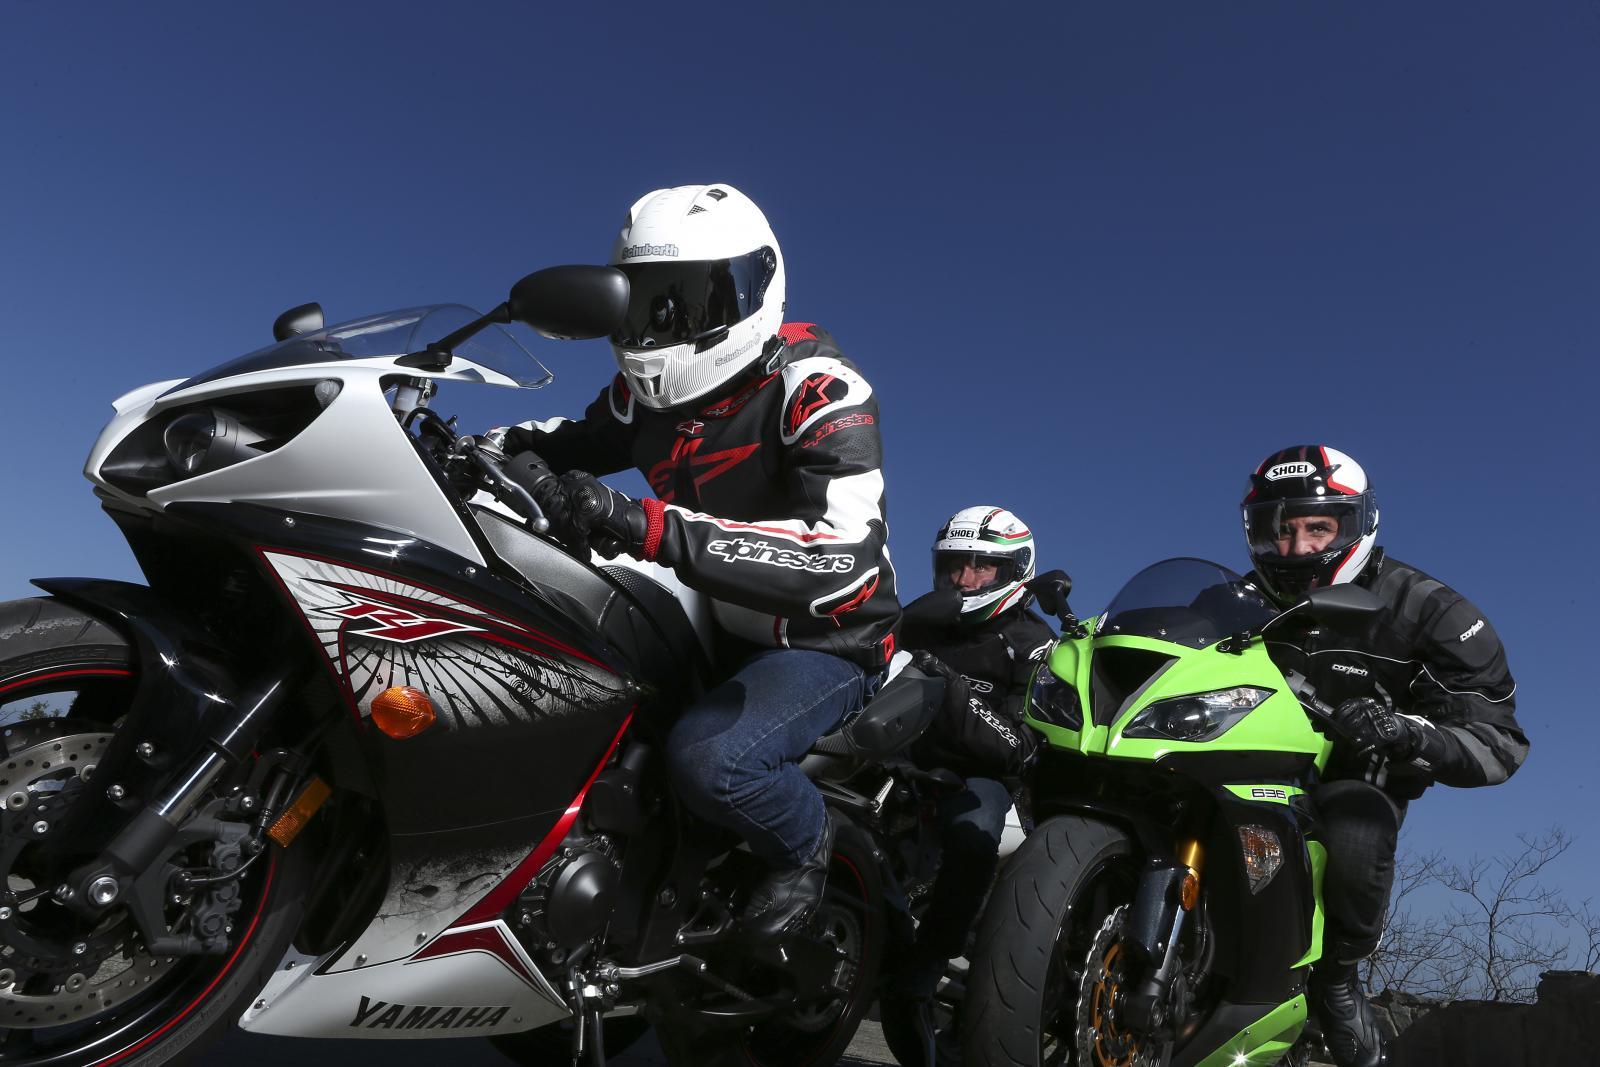 scala rider q1 instructions